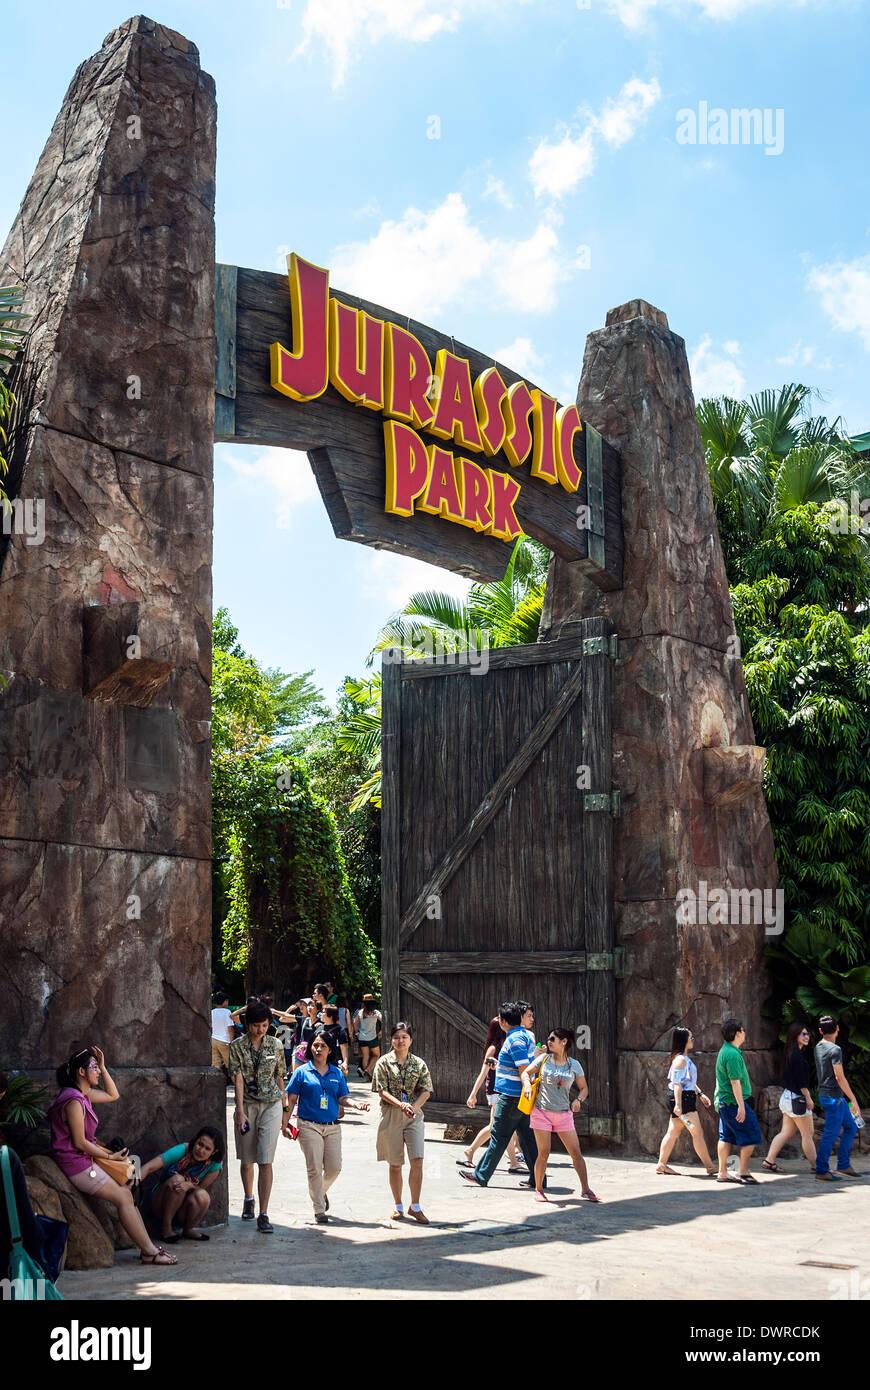 Jurassic Park, Universal Studios, Singapore Stock Photo ...